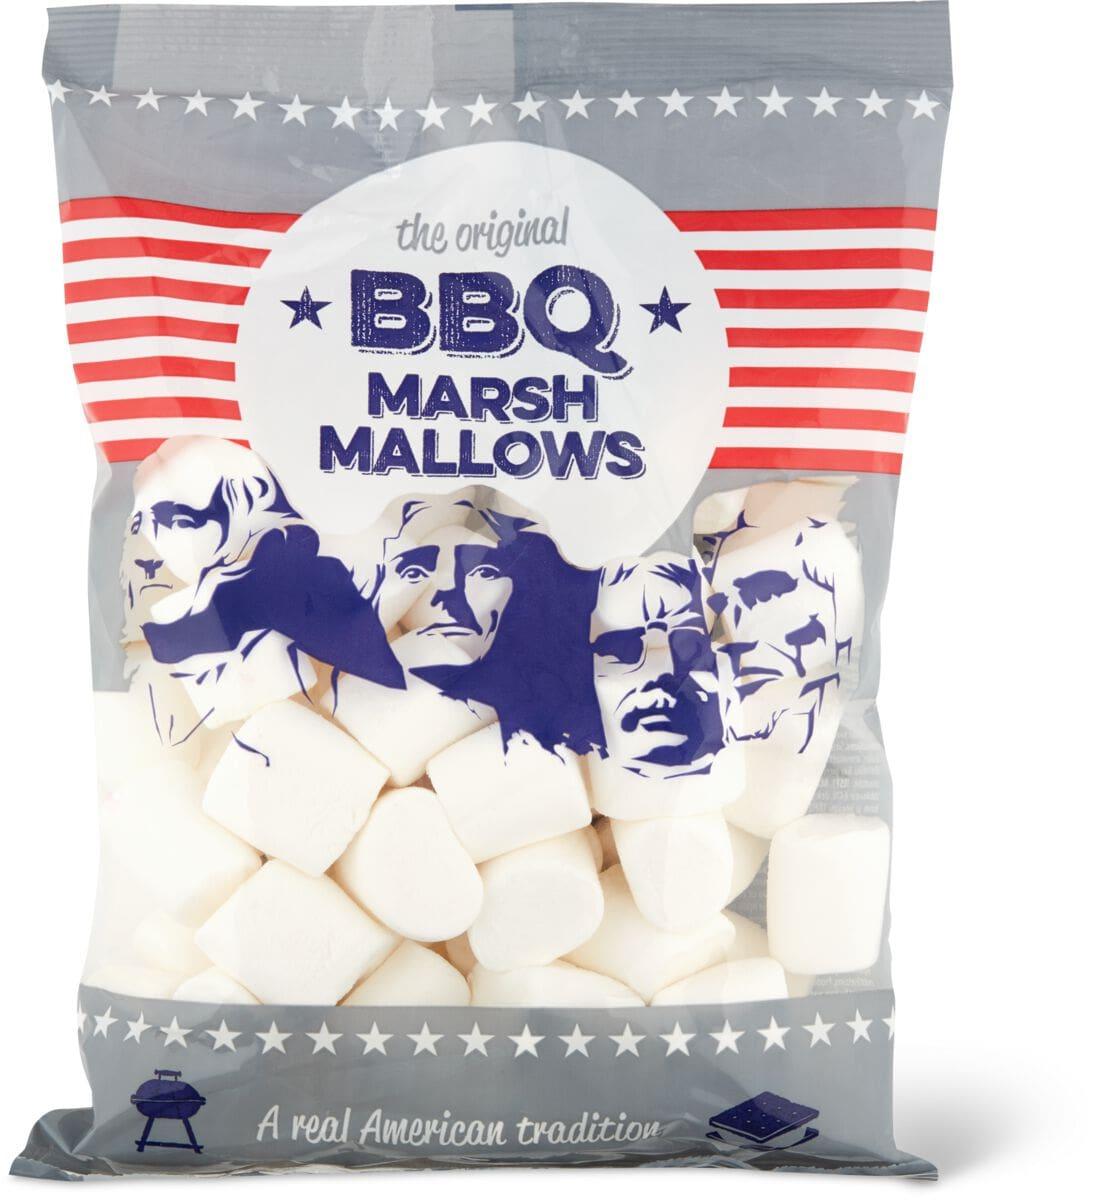 The original Marshmallows bbq